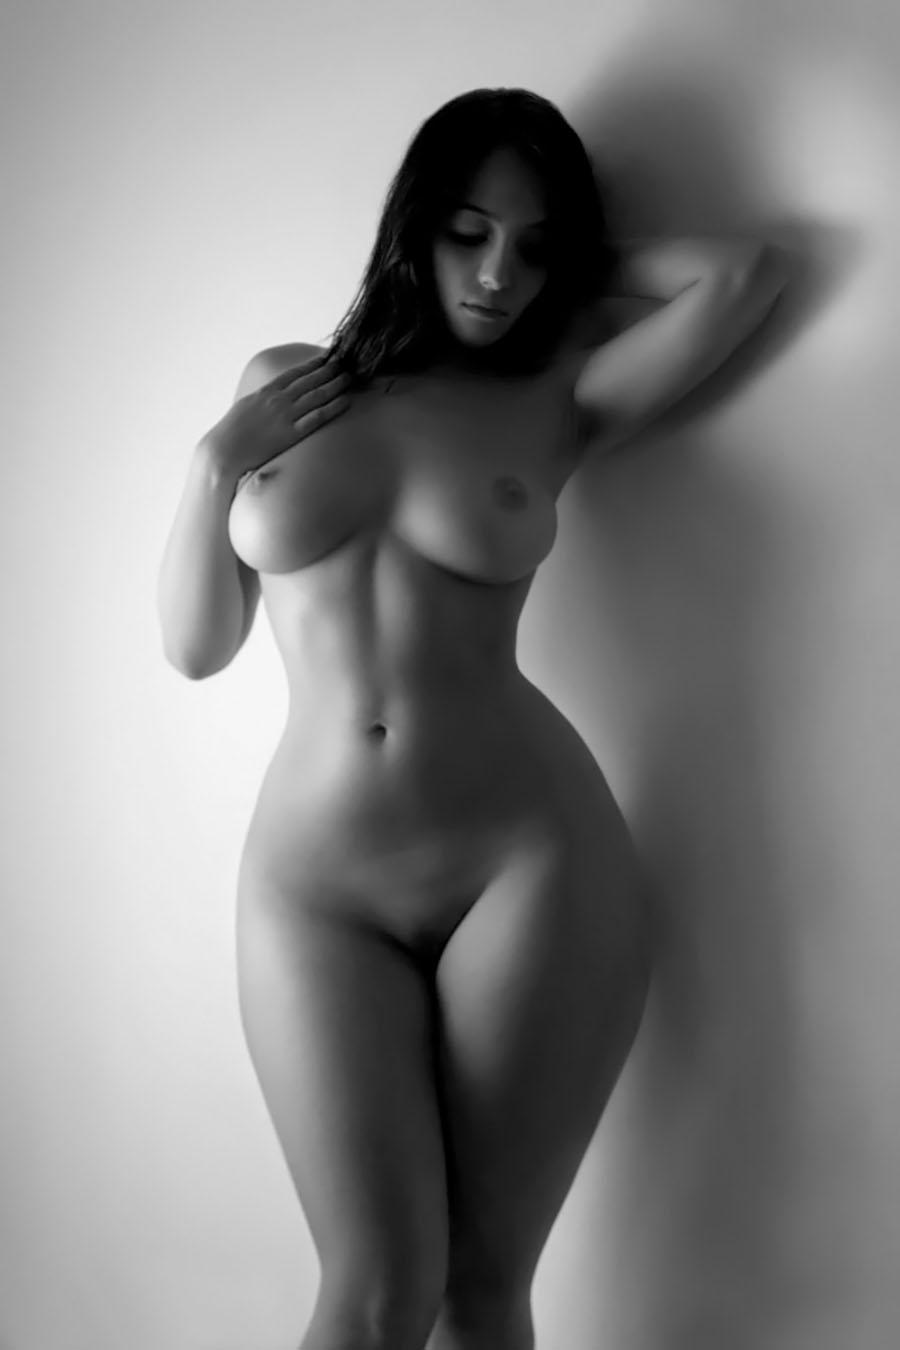 Фото красивая фигура голой девушки